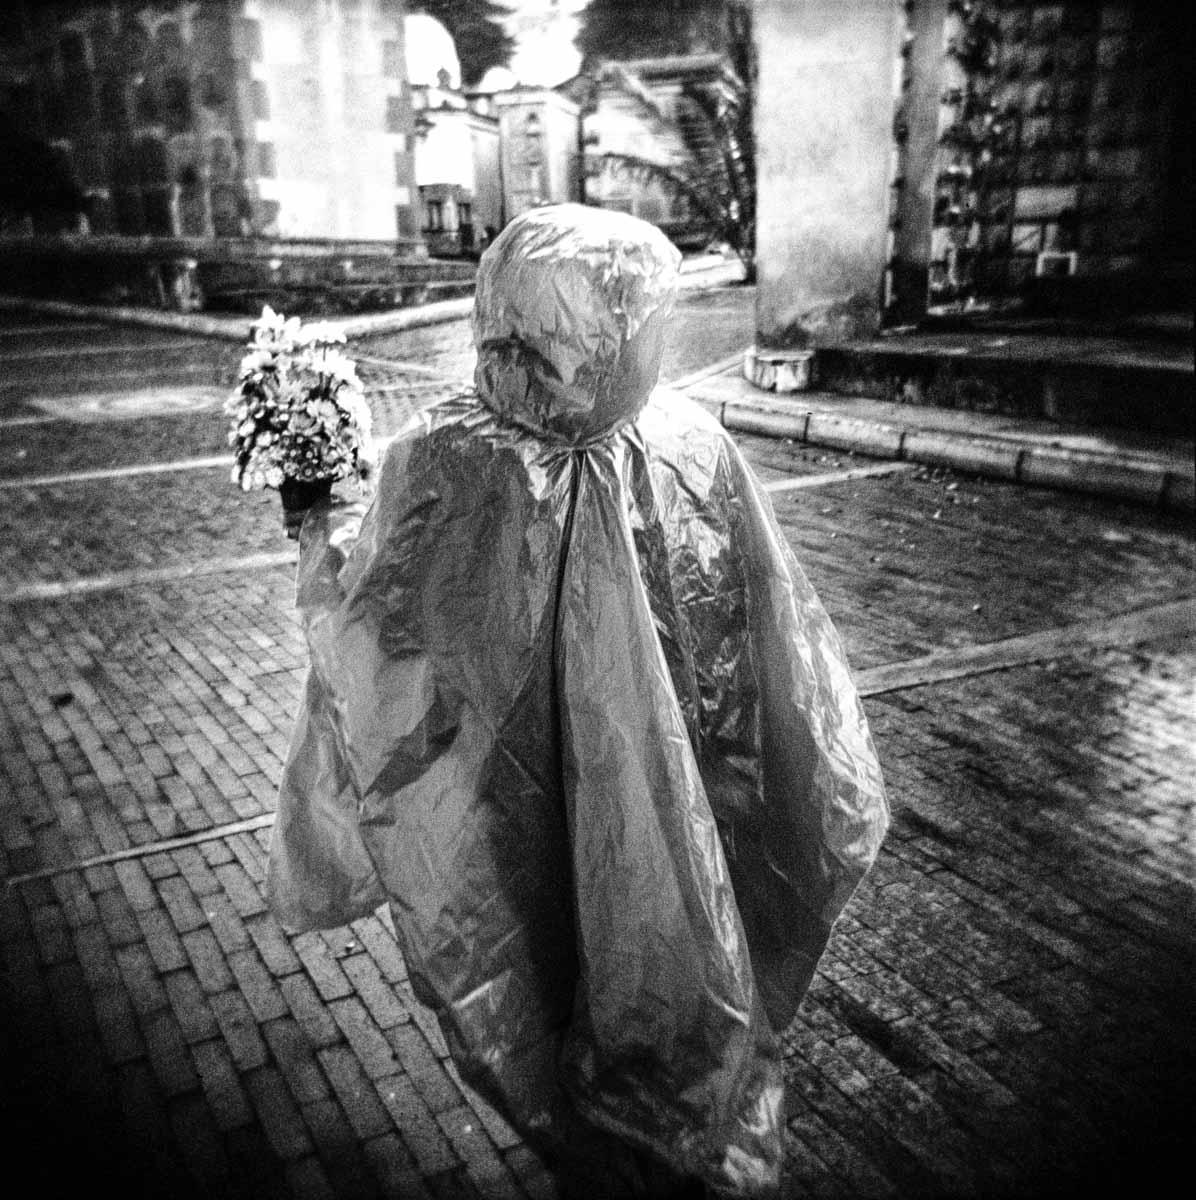 Gloomy_Bogota_12